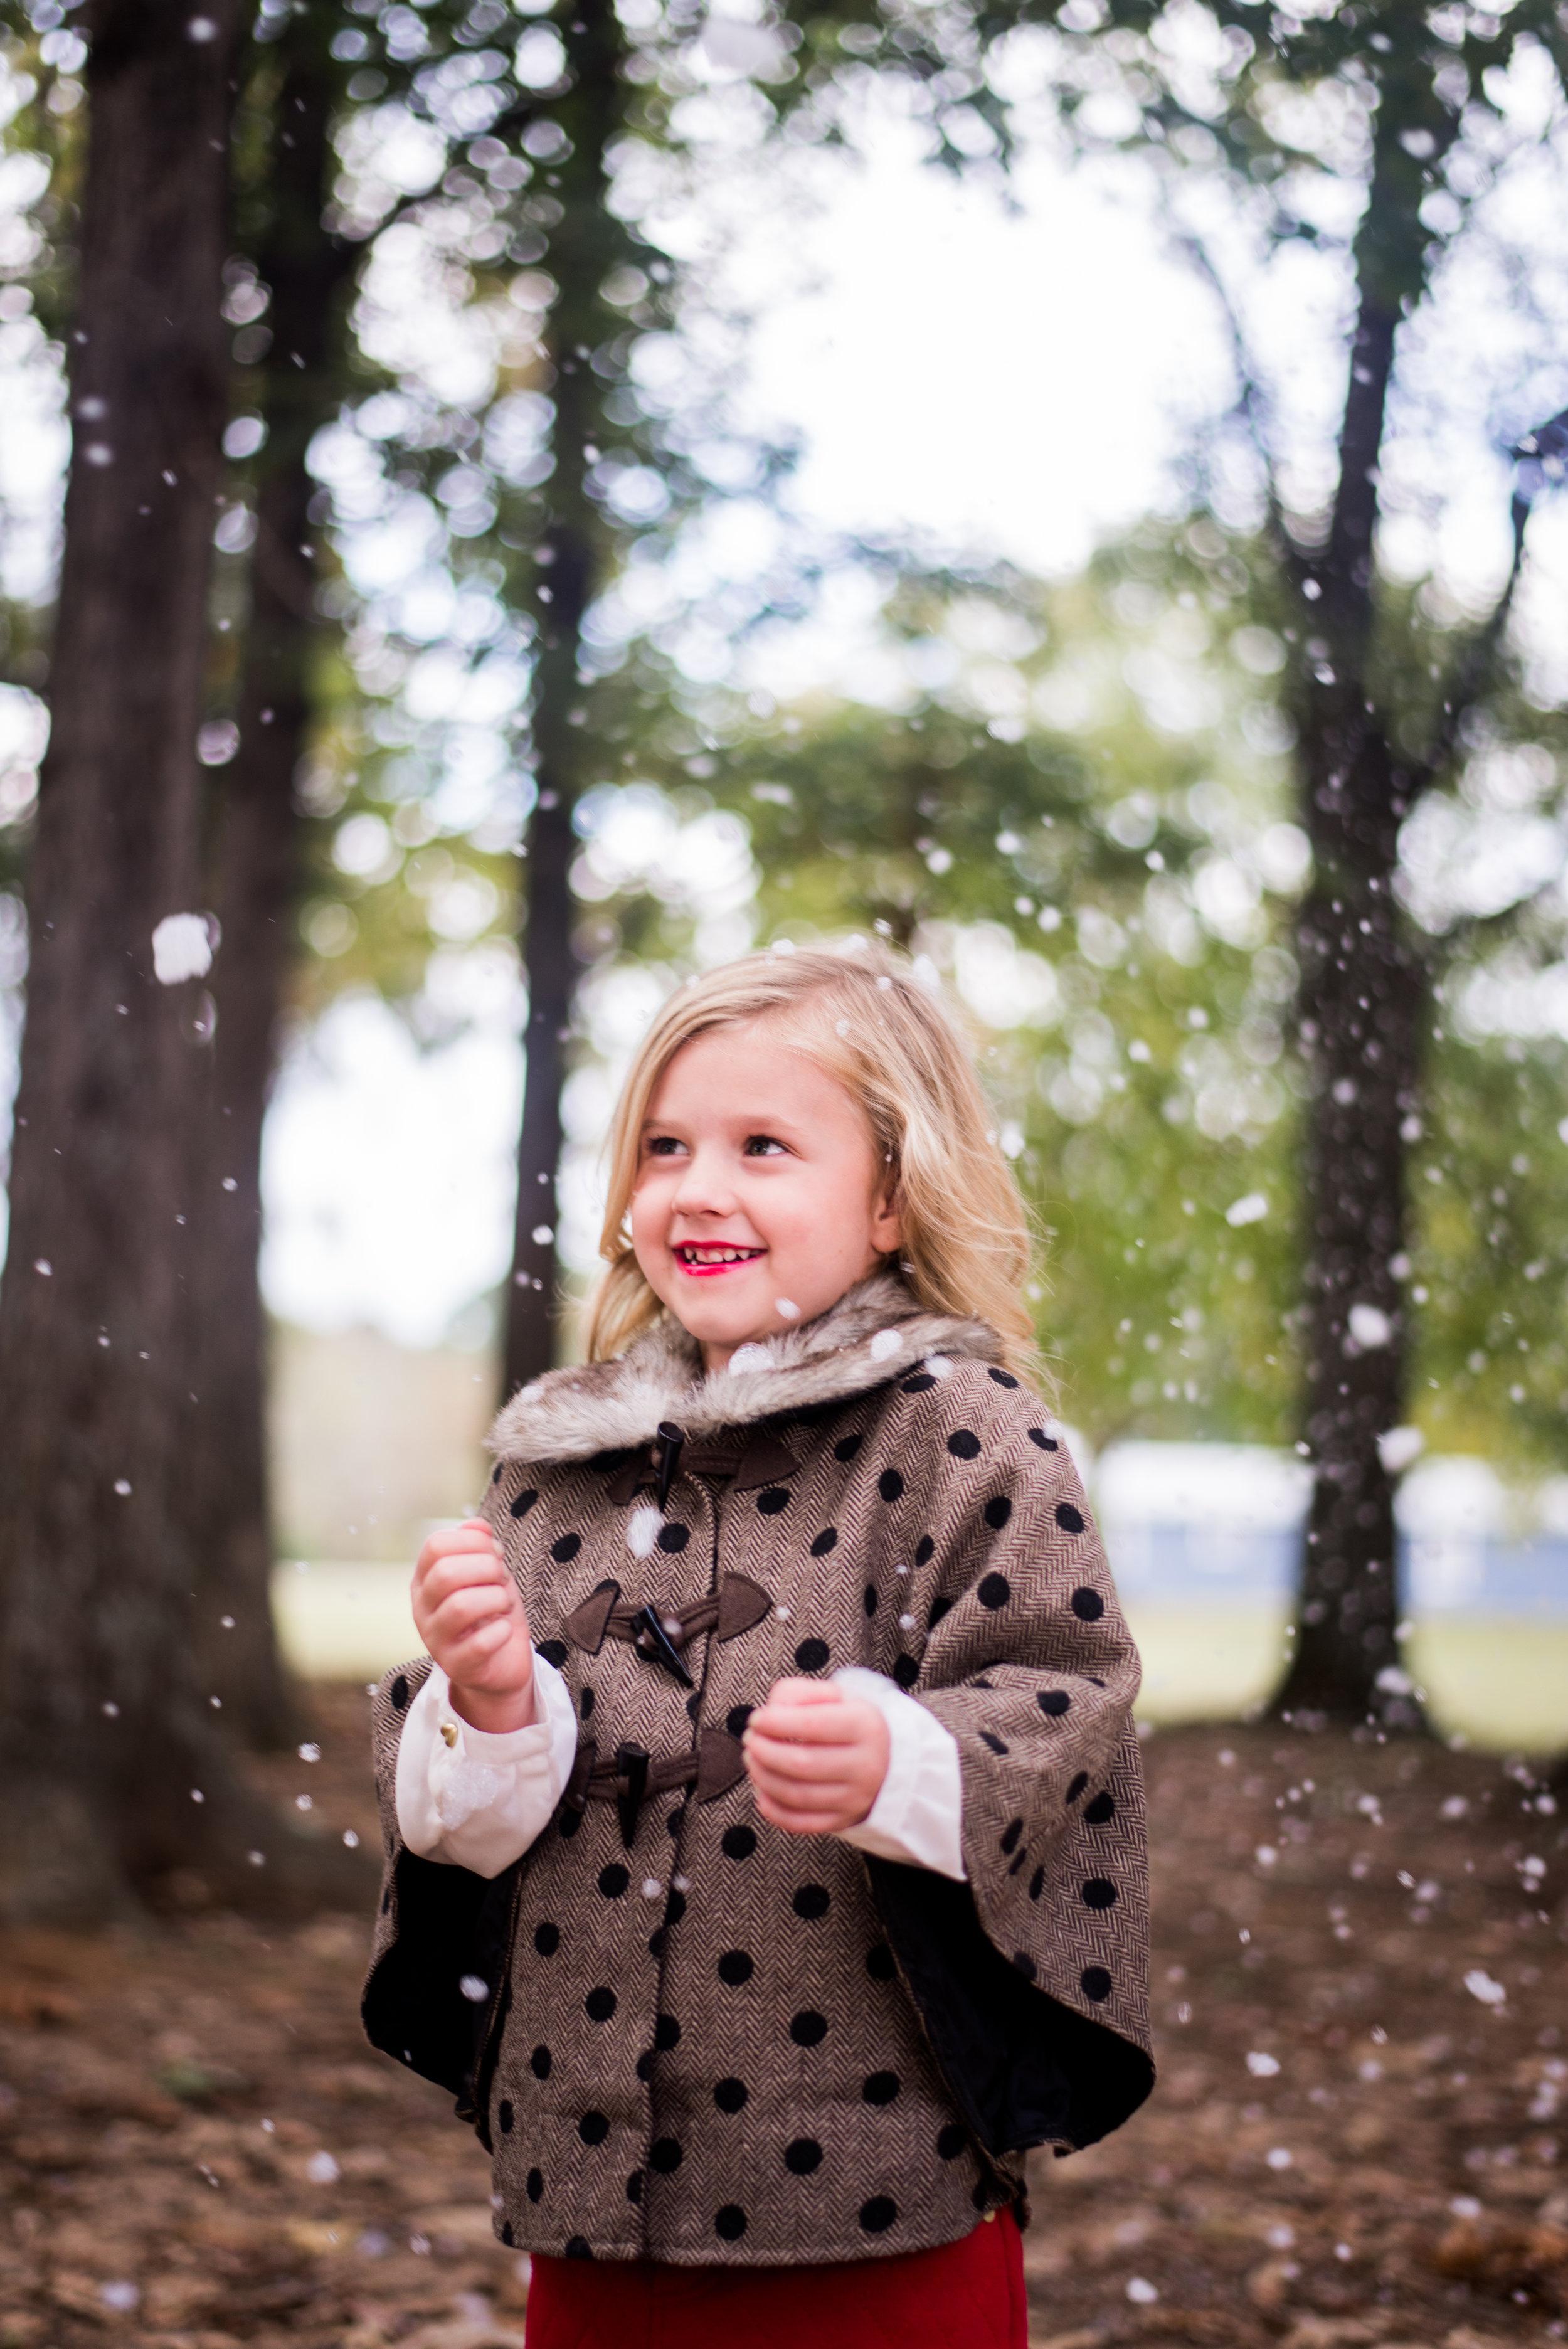 Arkansas Snow Family Photos - Natalie Smith Photography